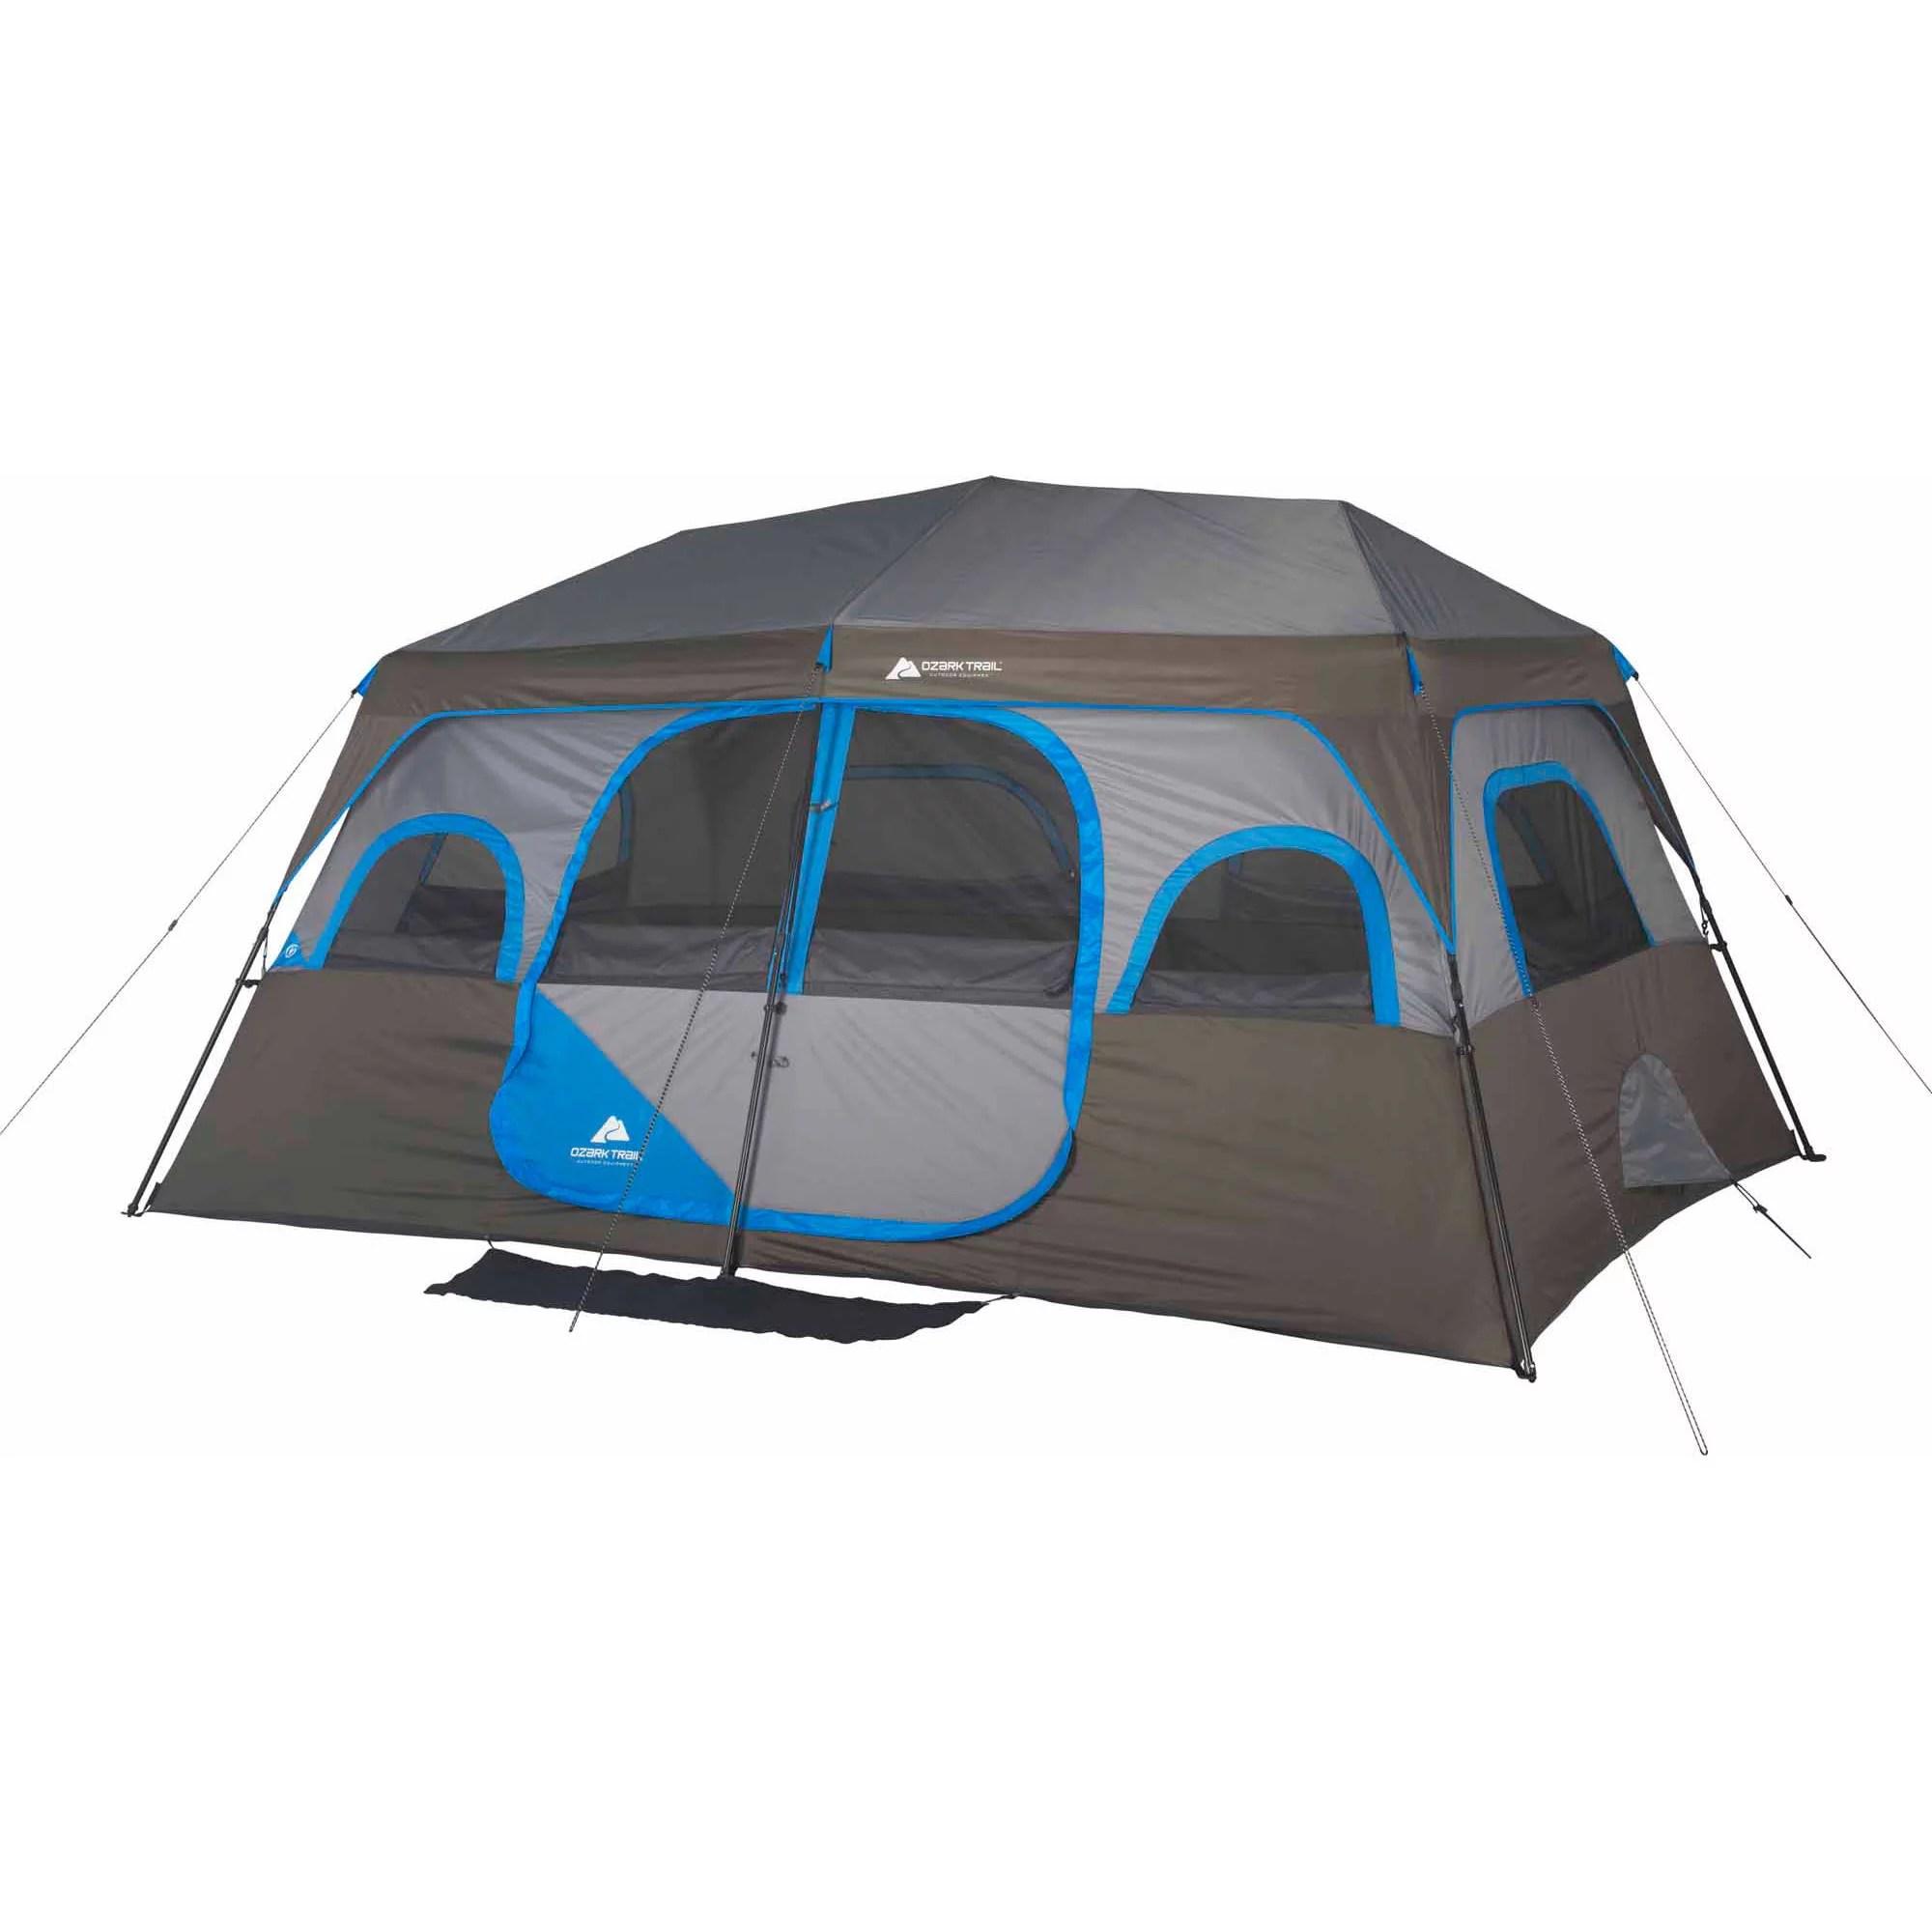 Ozark Trail 10 Person 2 Room Instant Cabin Tent